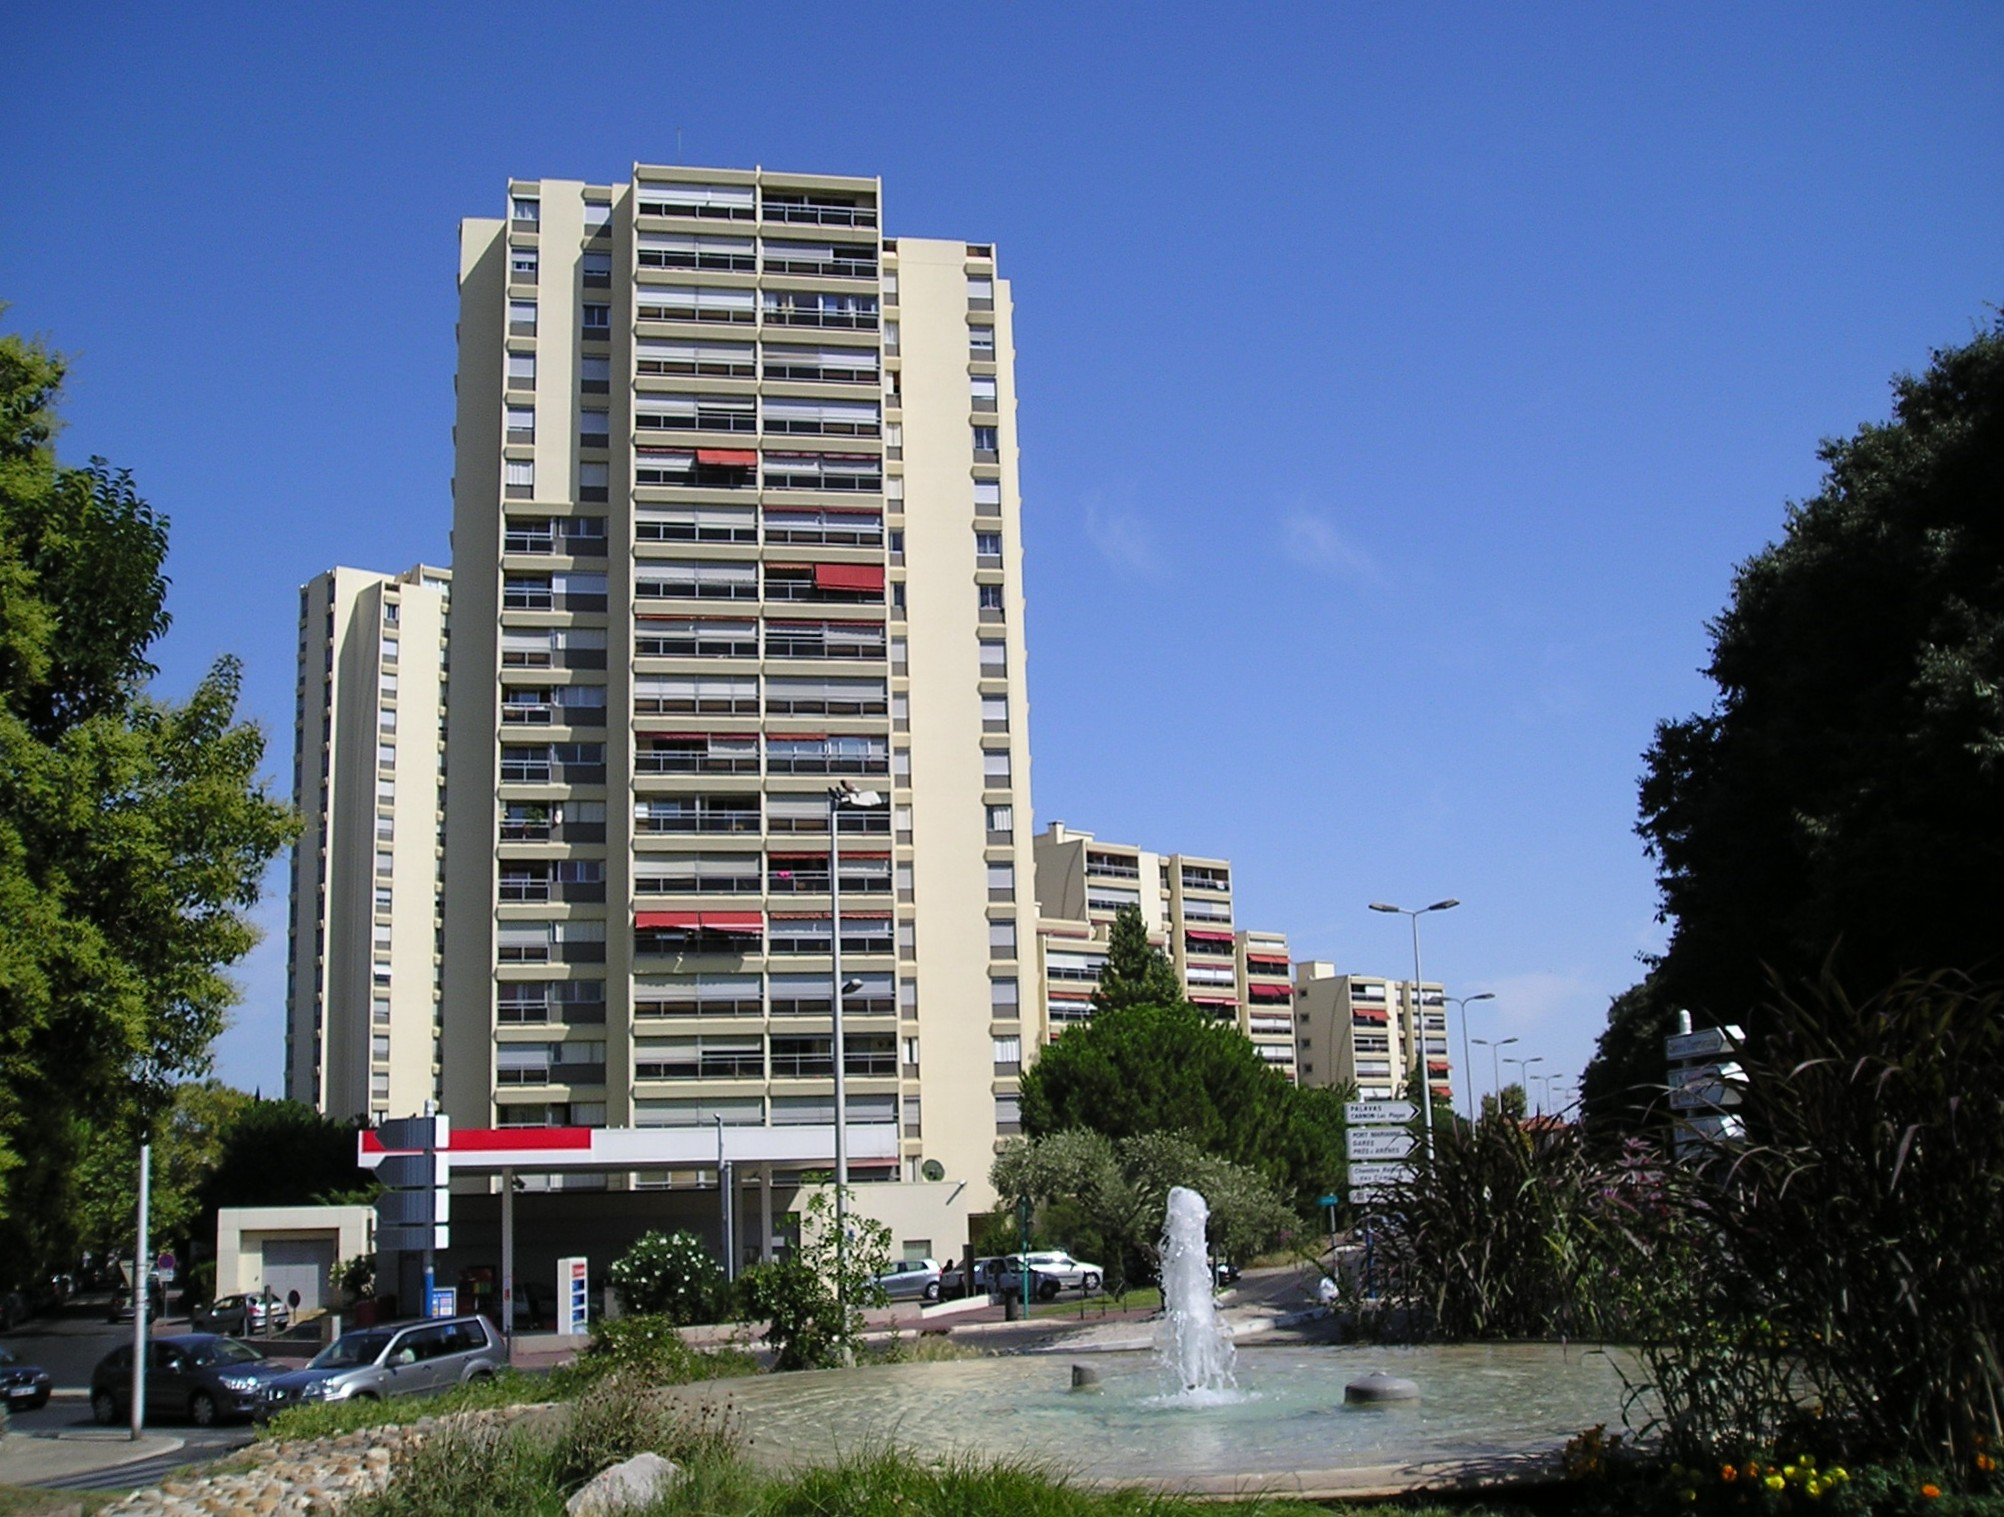 File:Montpellier NouveauMonde 06082009.JPG - Wikimedia Commons